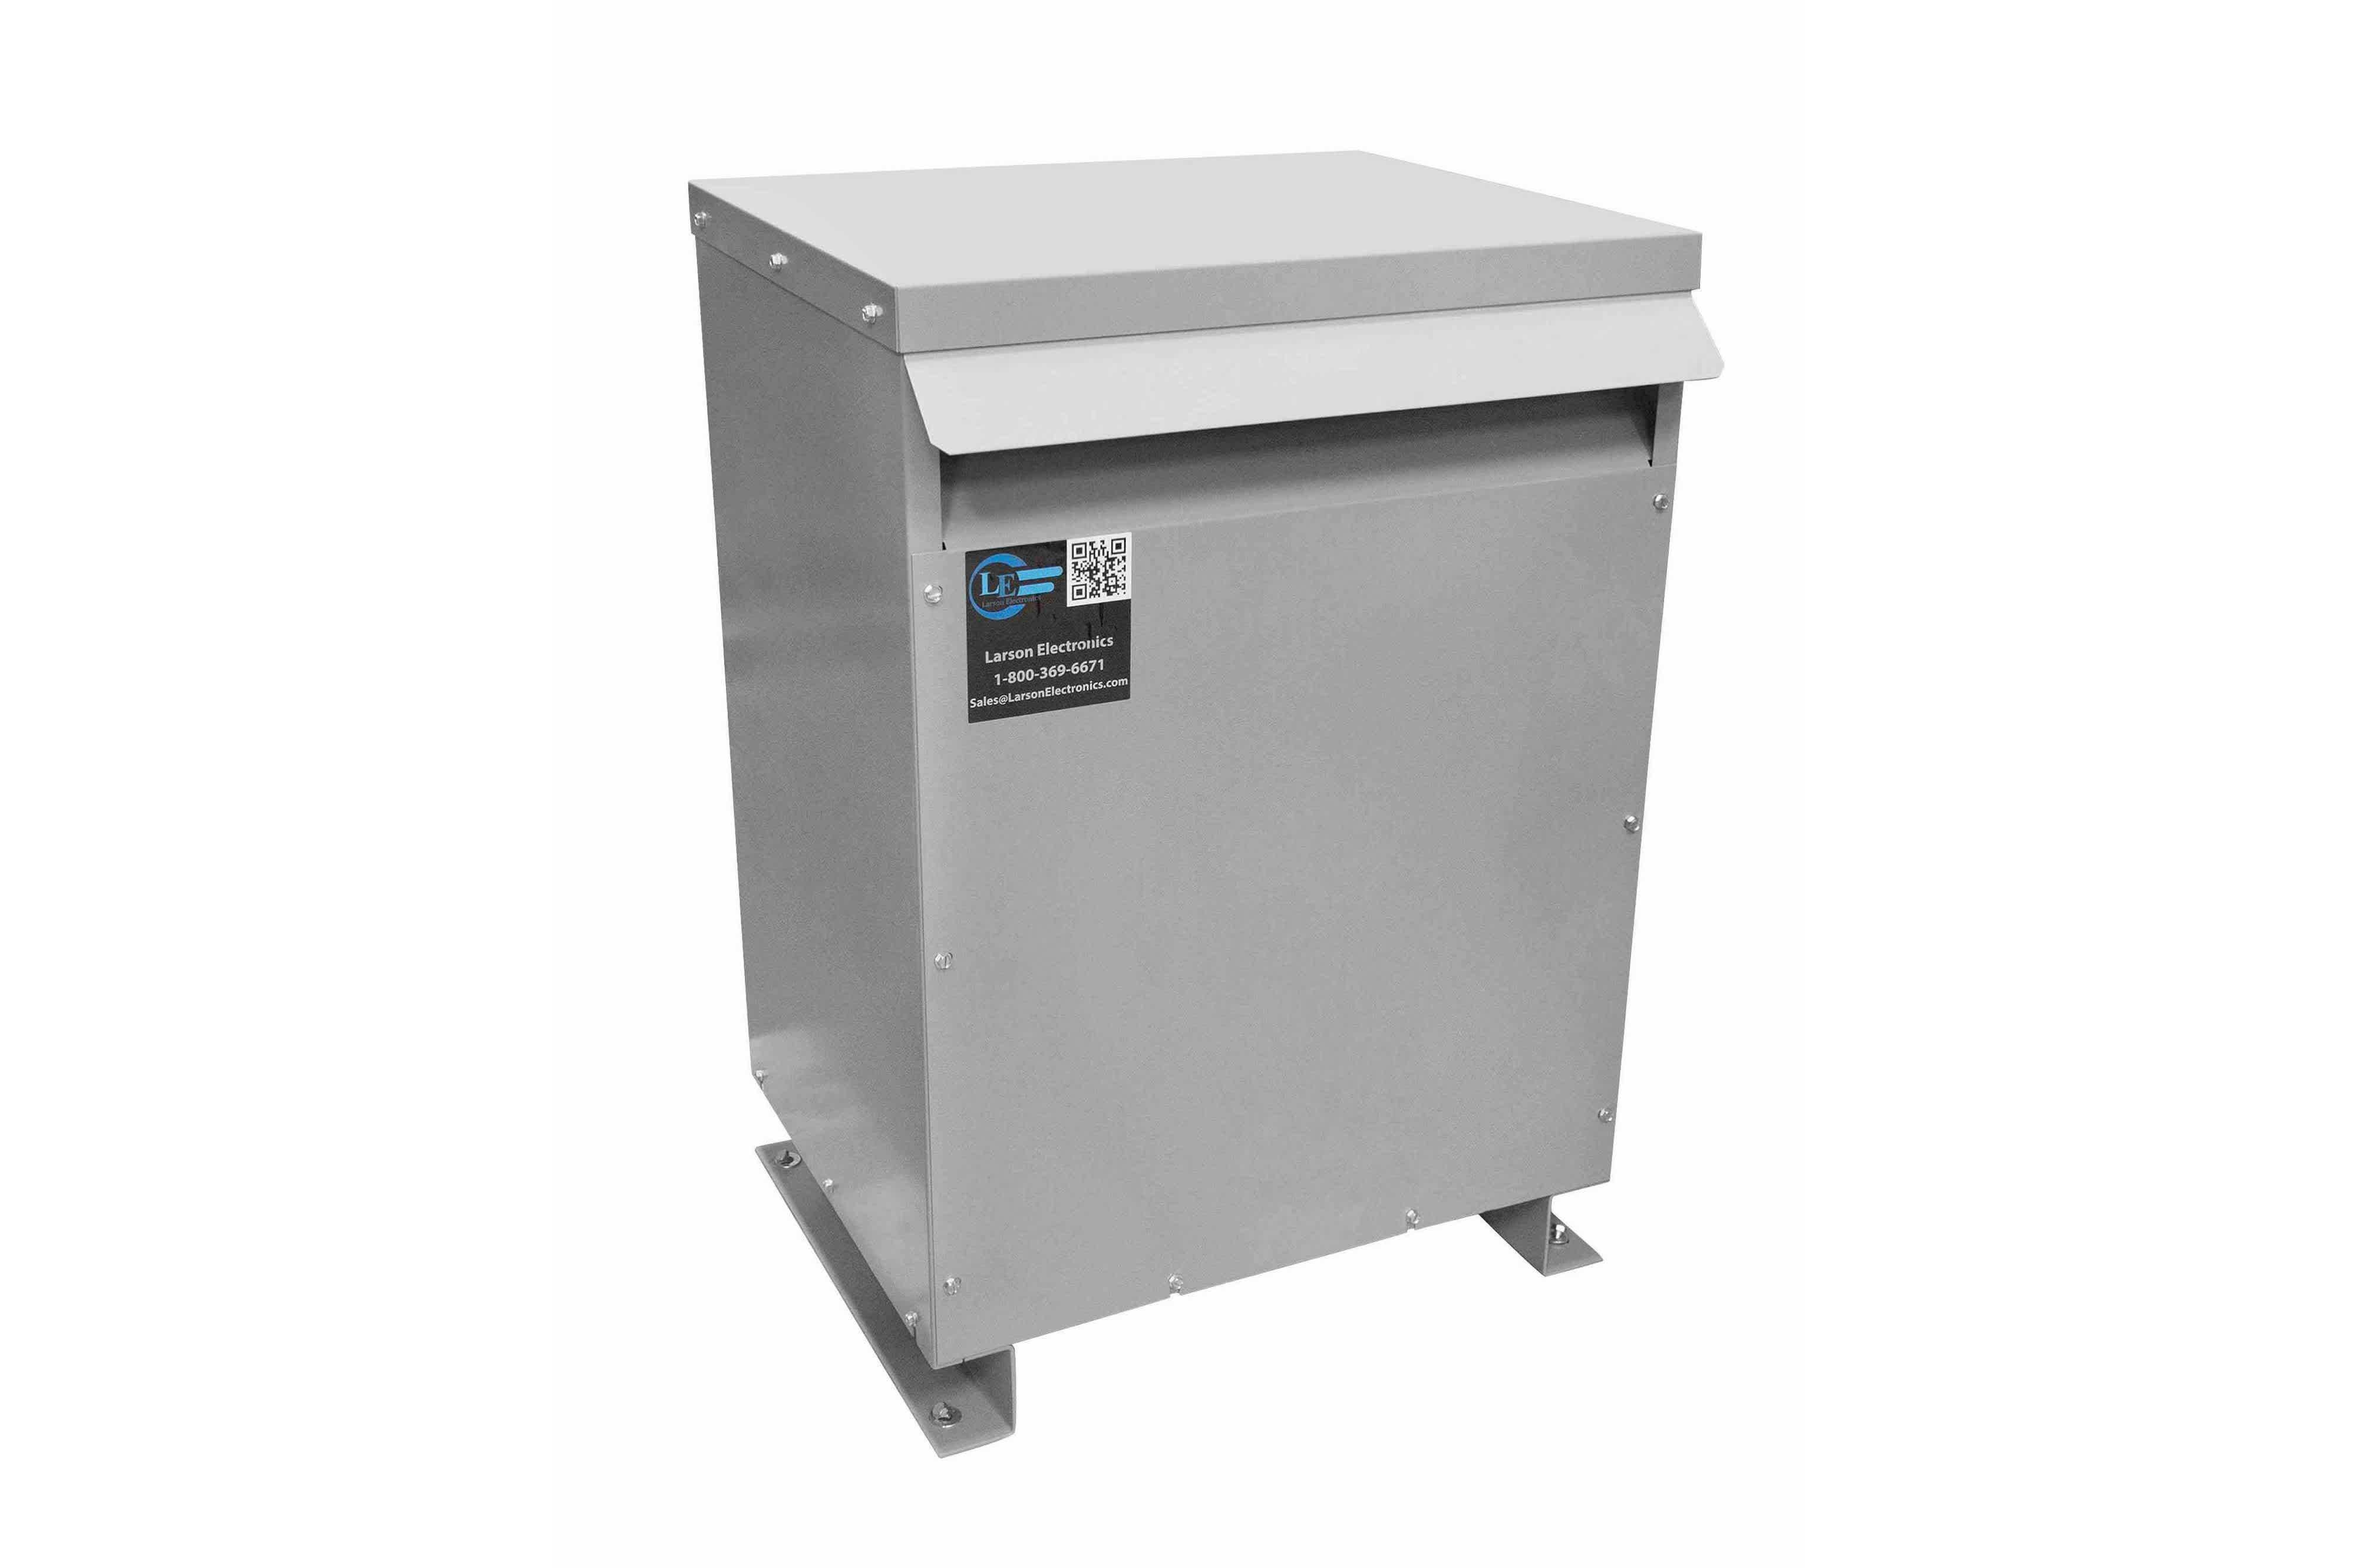 20 kVA 3PH Isolation Transformer, 240V Wye Primary, 600Y/347 Wye-N Secondary, N3R, Ventilated, 60 Hz